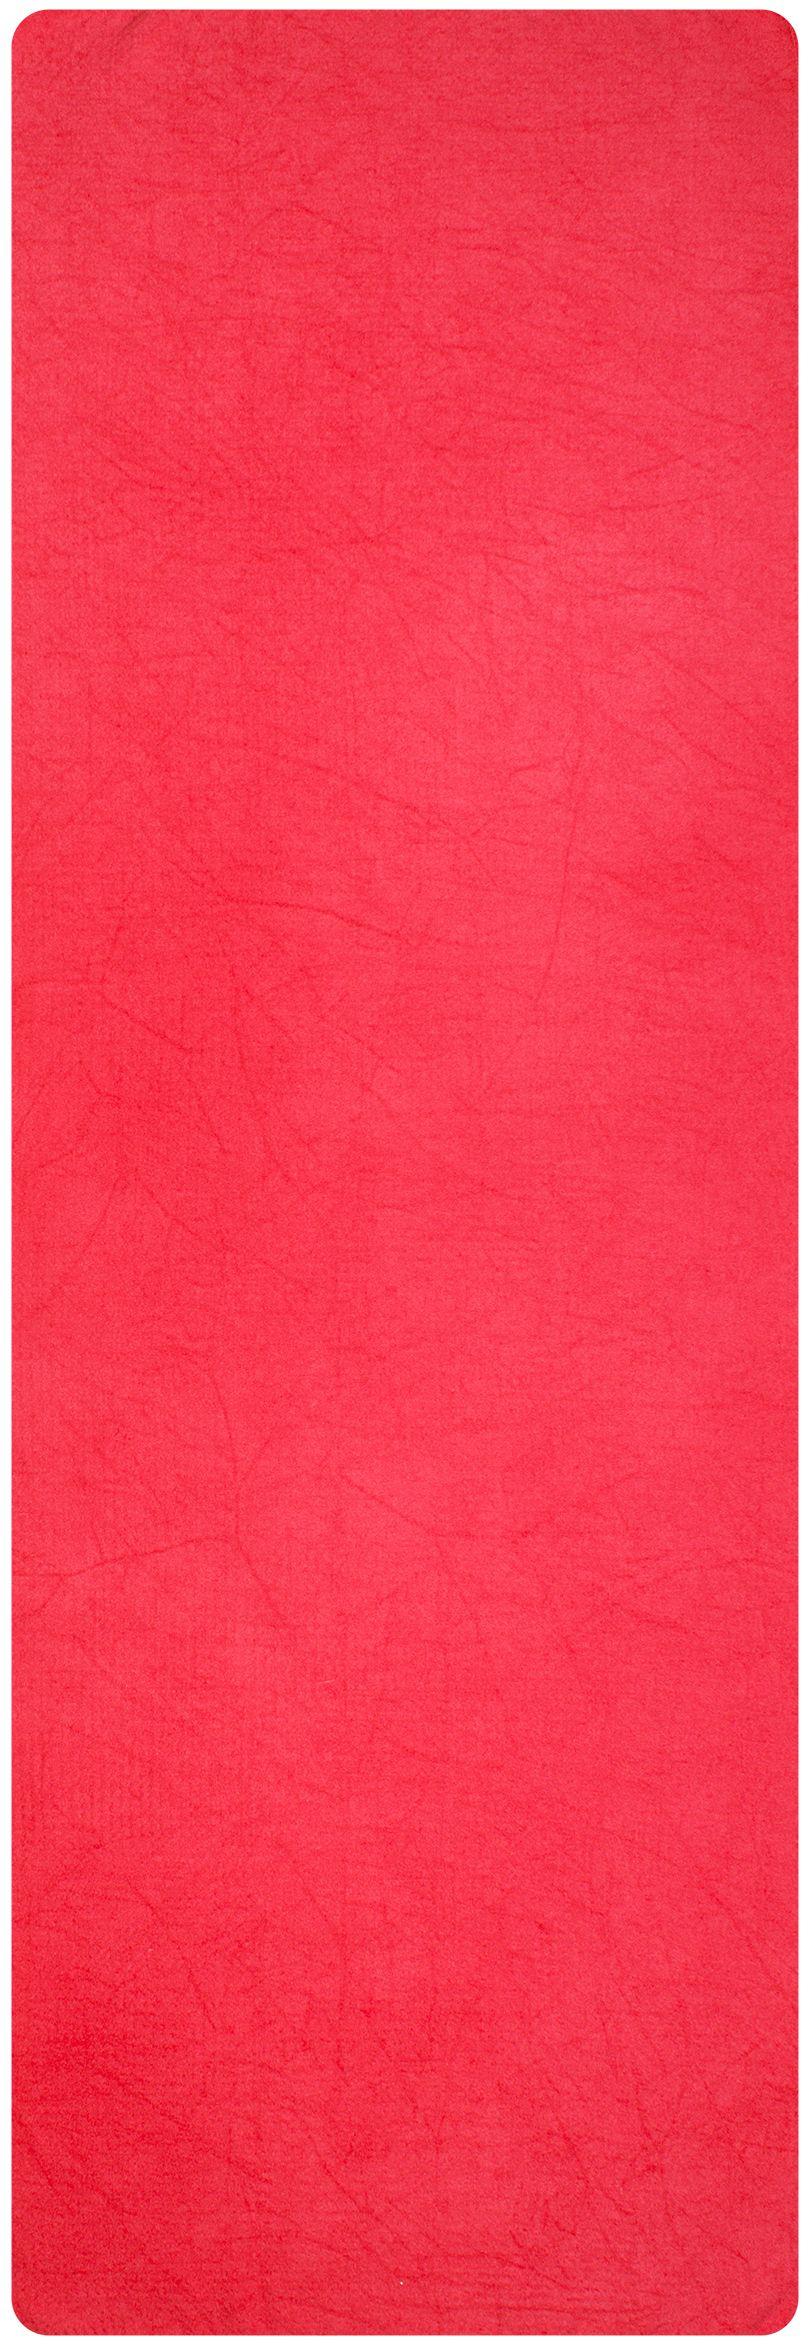 Yoga Handdoek Antislip • Aura •